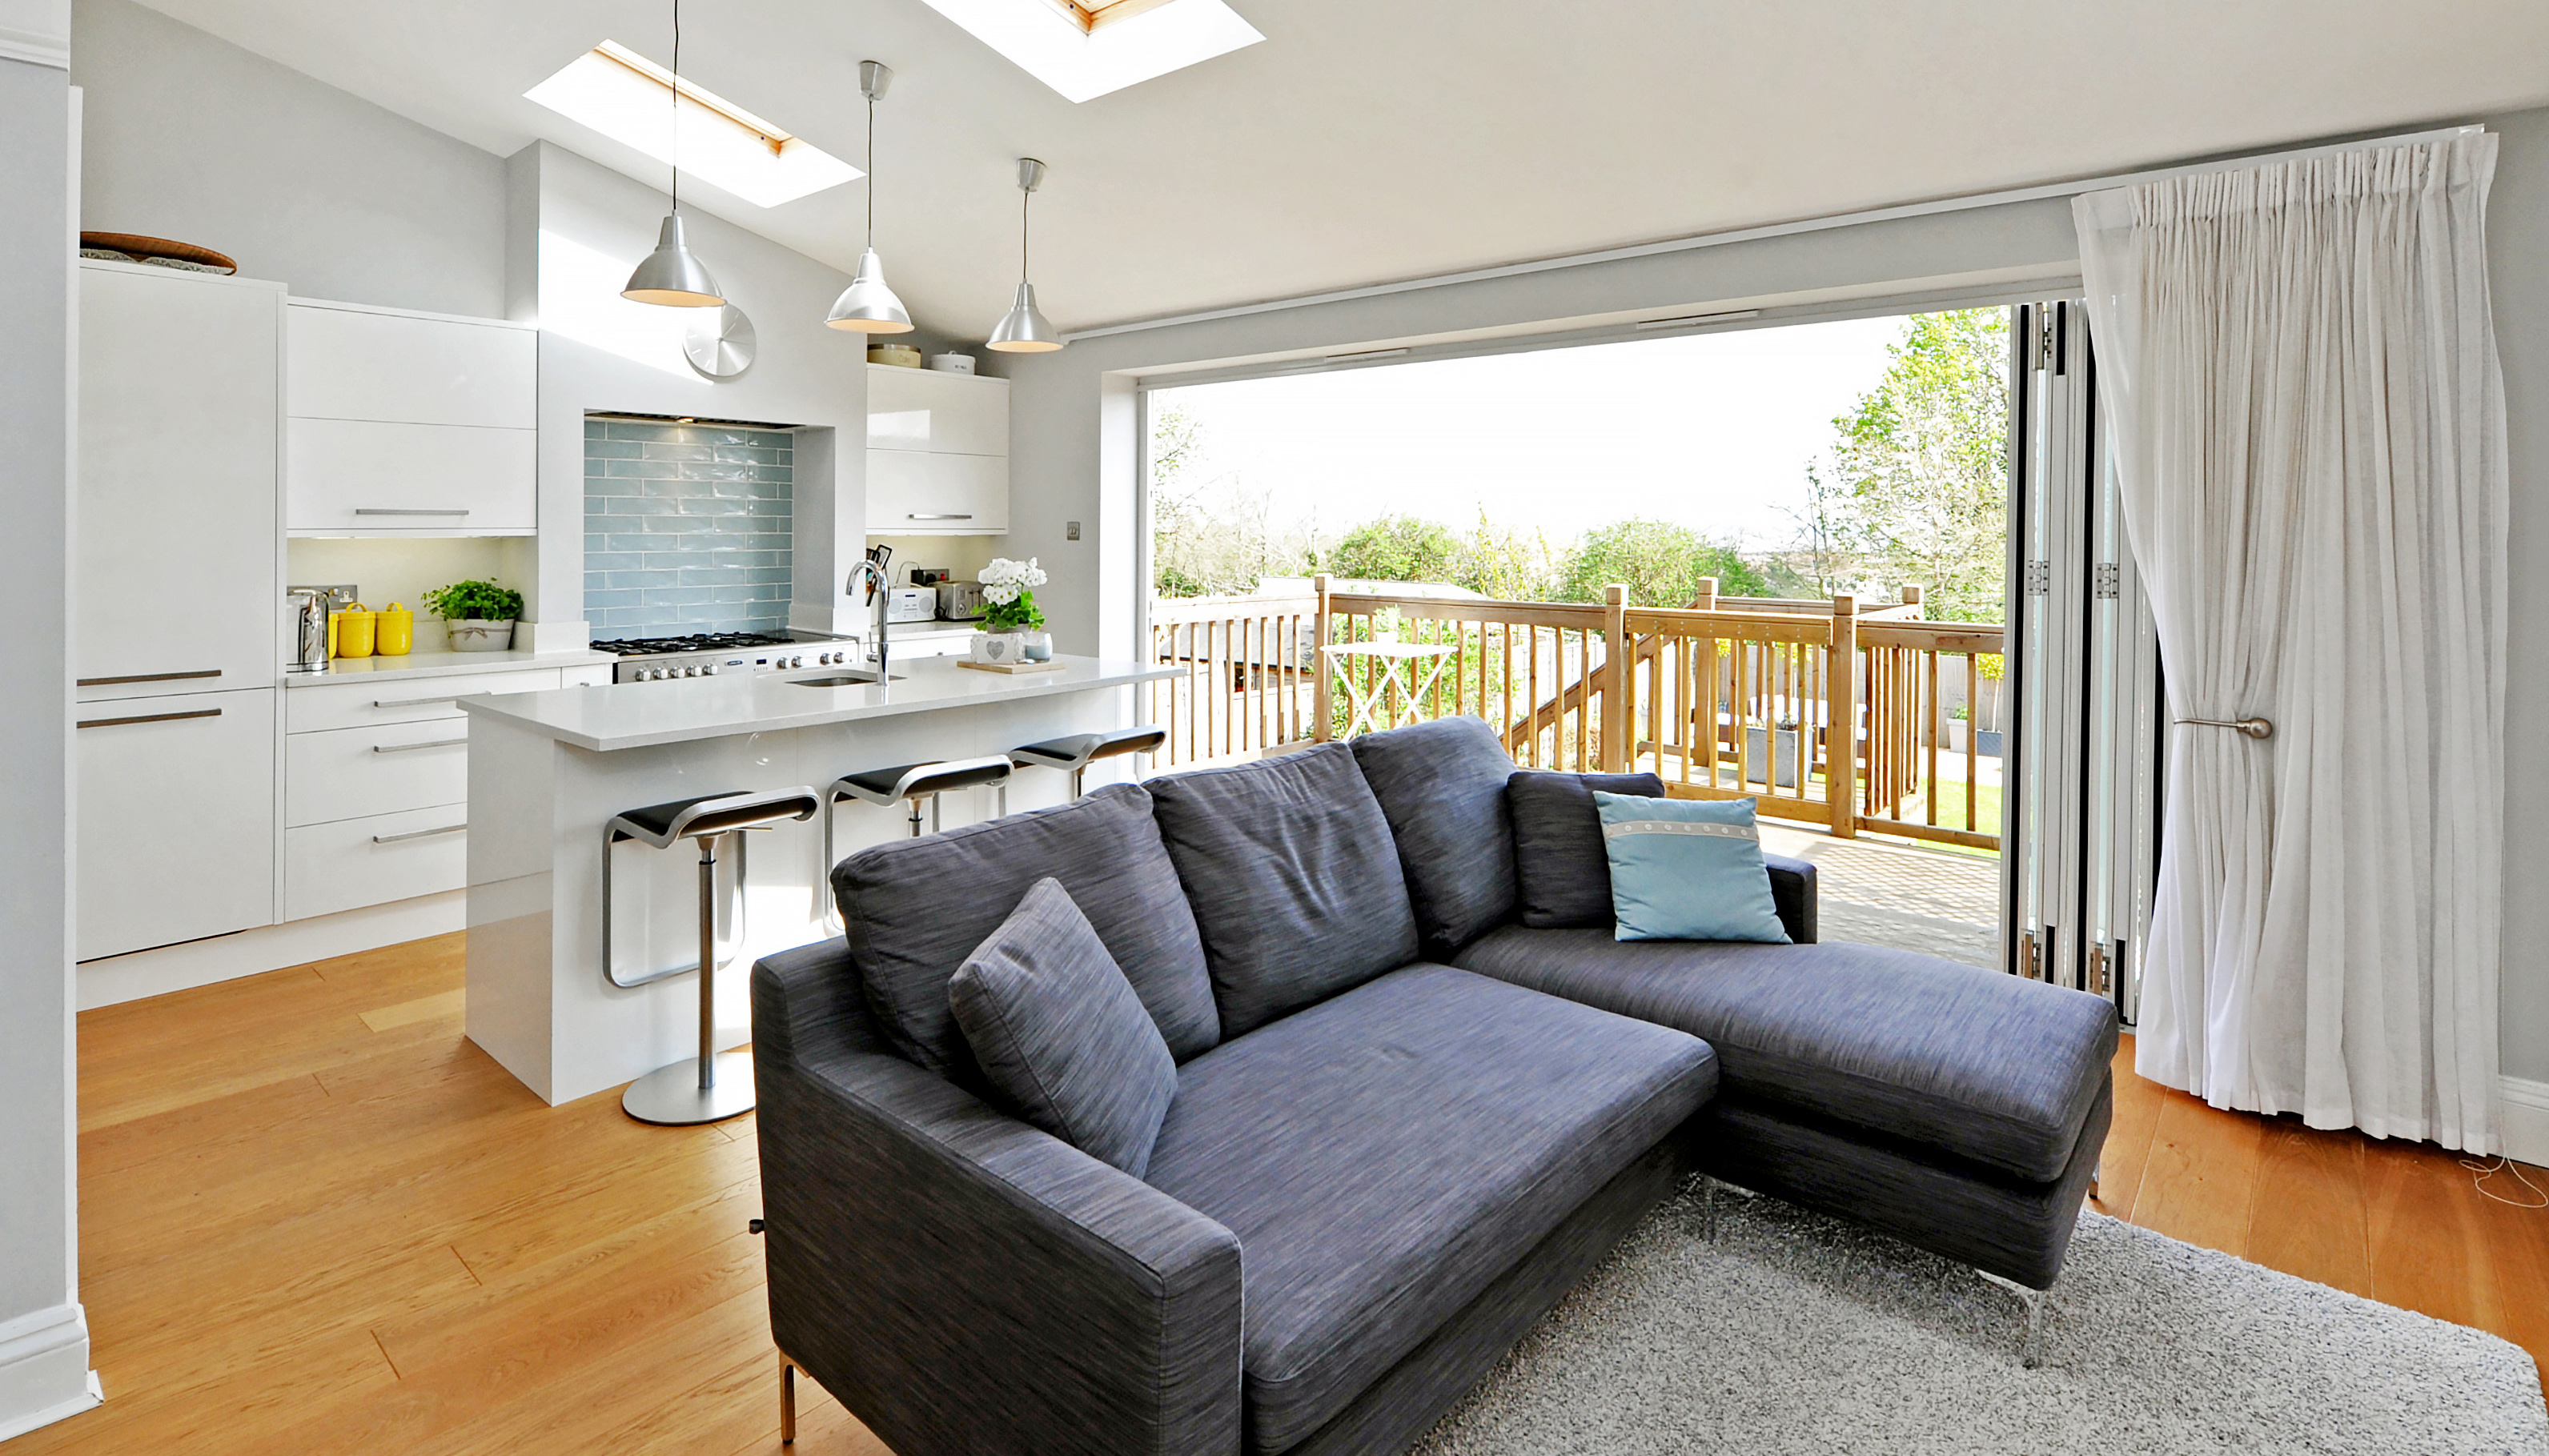 home interior design services. Bristol Family Home Interior Design Project  Room Services By Margi Rose Designs